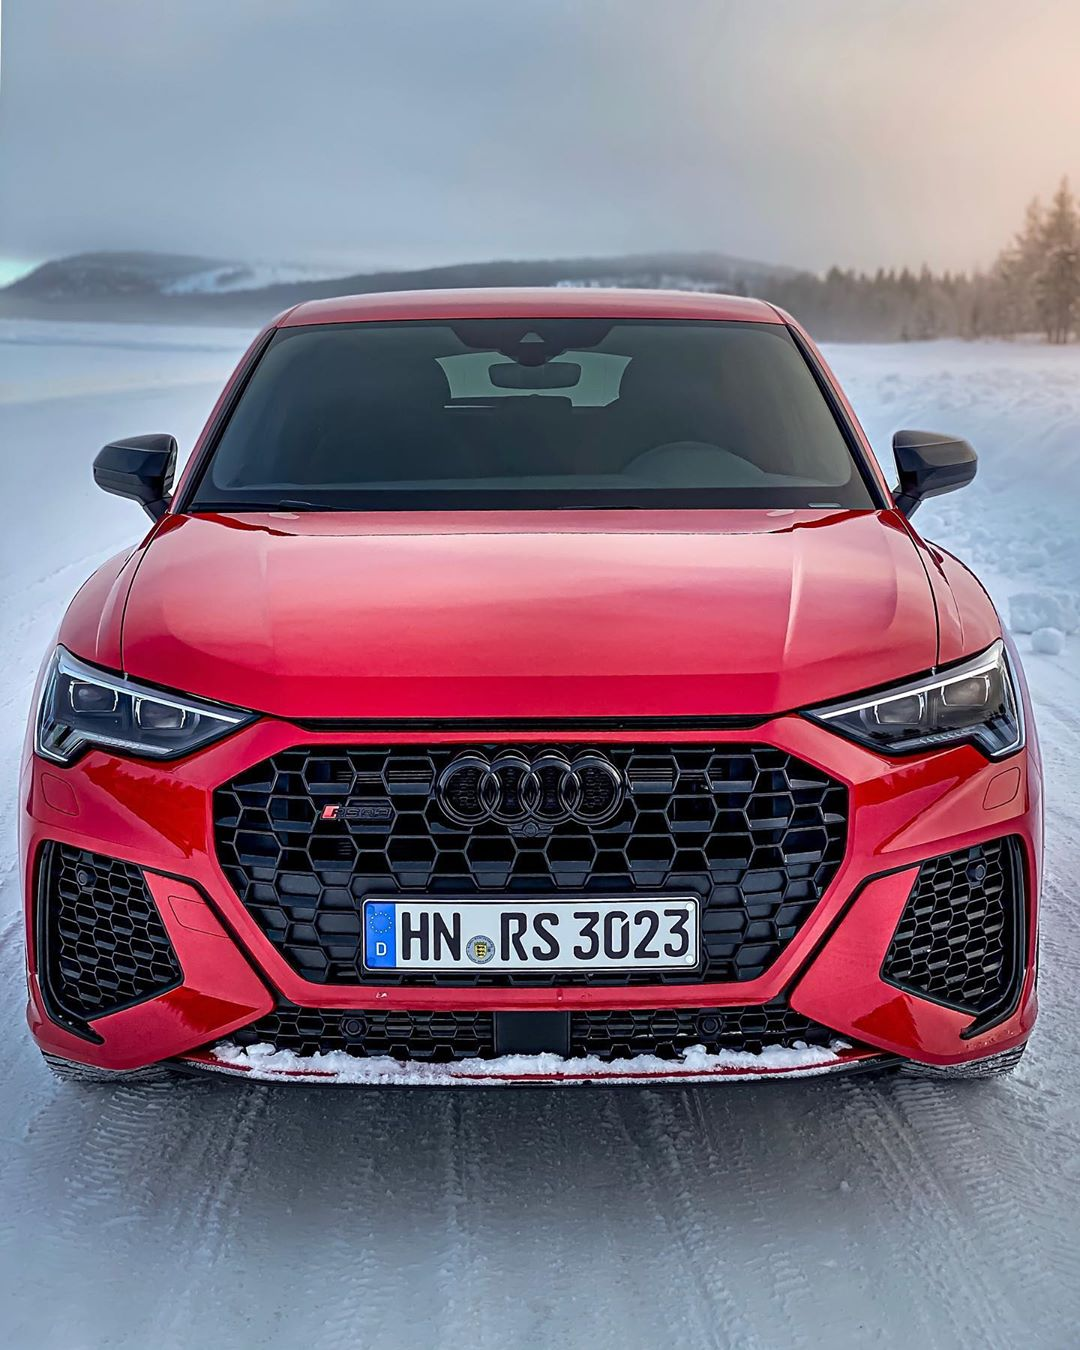 S P O R T B A C K RS Q3 today🏁❄️@audi_de @audisport #audisport #audirs #audirsq3 #rsq3 #rsq3sportback #audirsq3sportback #snow #sweden #arvidsjaur #automanntv